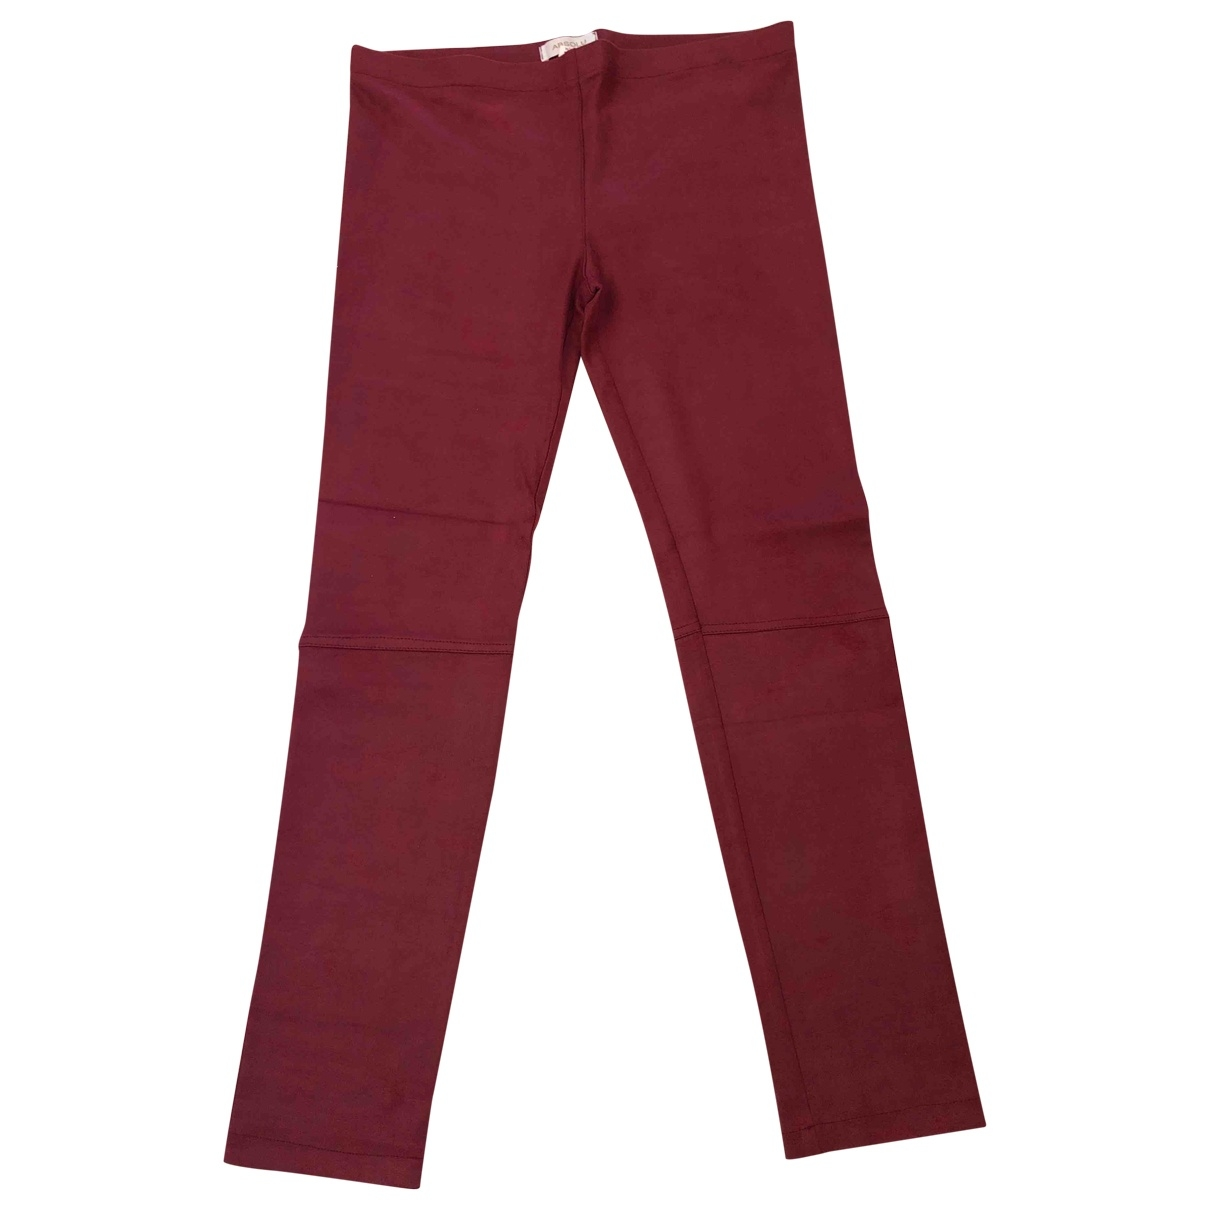 Absolu \N Burgundy Trousers for Women 42 FR